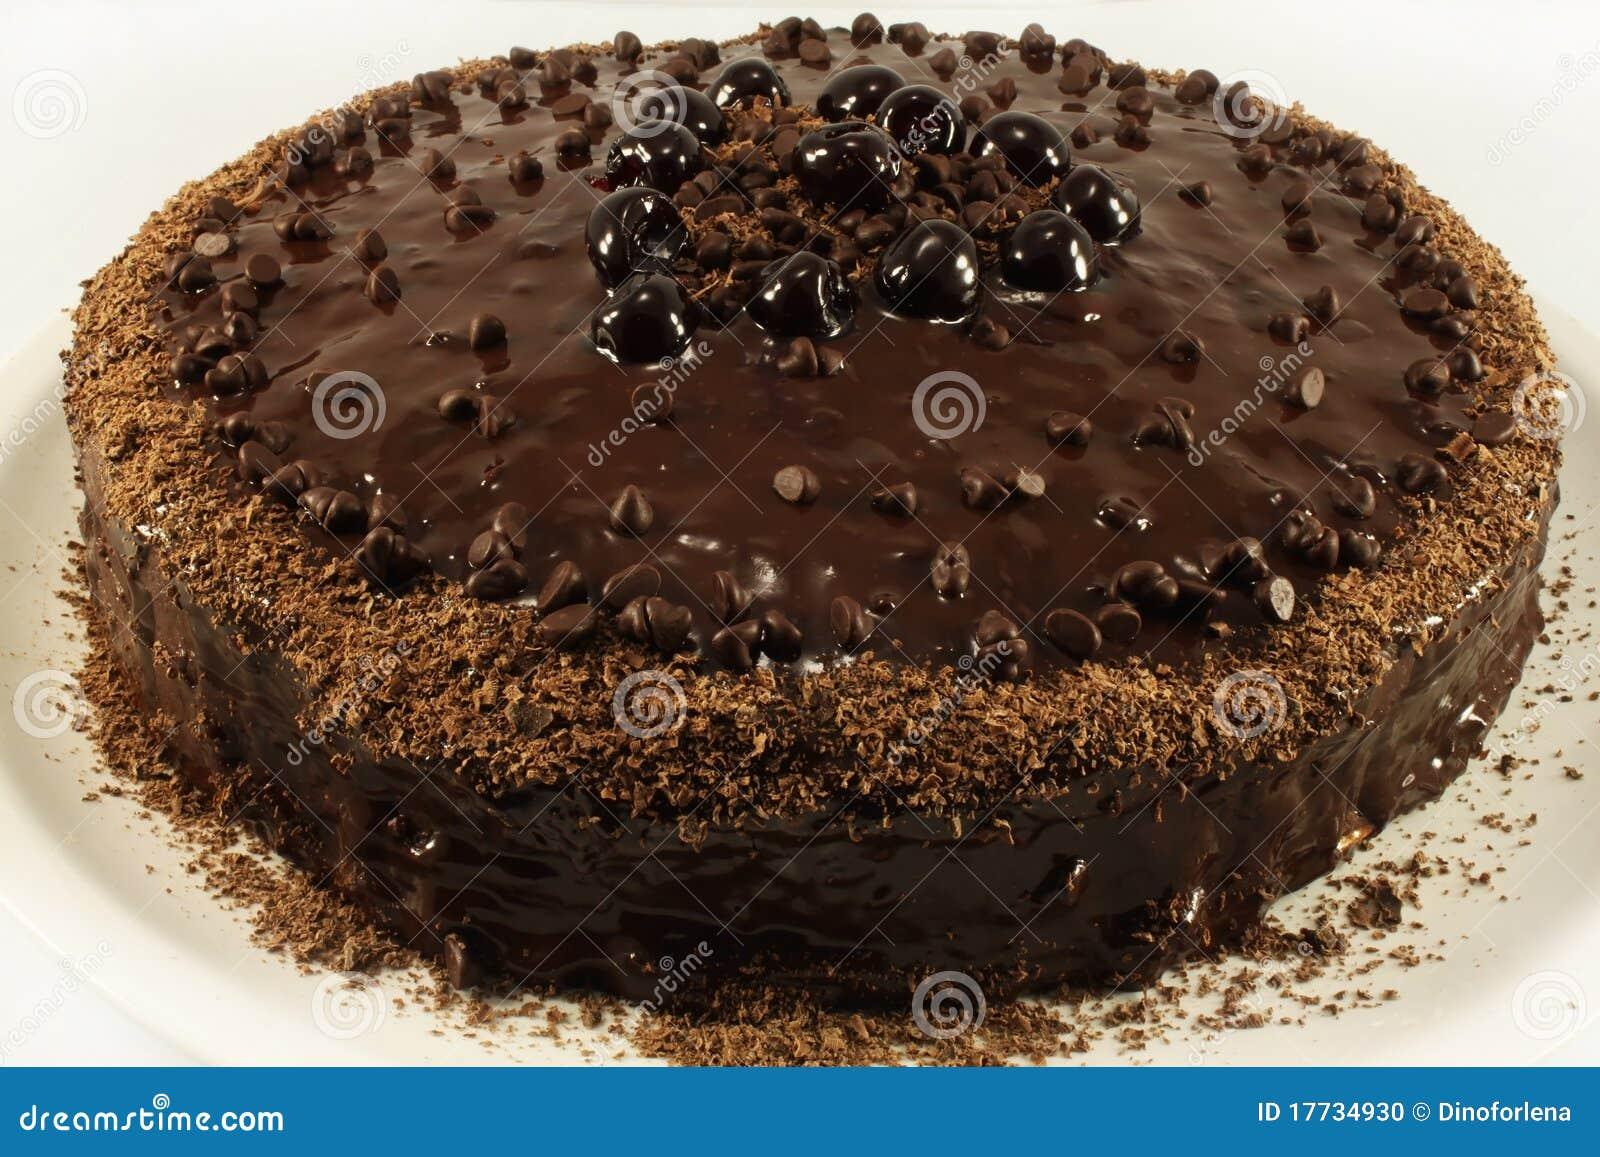 Unique Chocolate Cake Images : Unique A Chocolate Cake Stock Photo - Image: 17734930